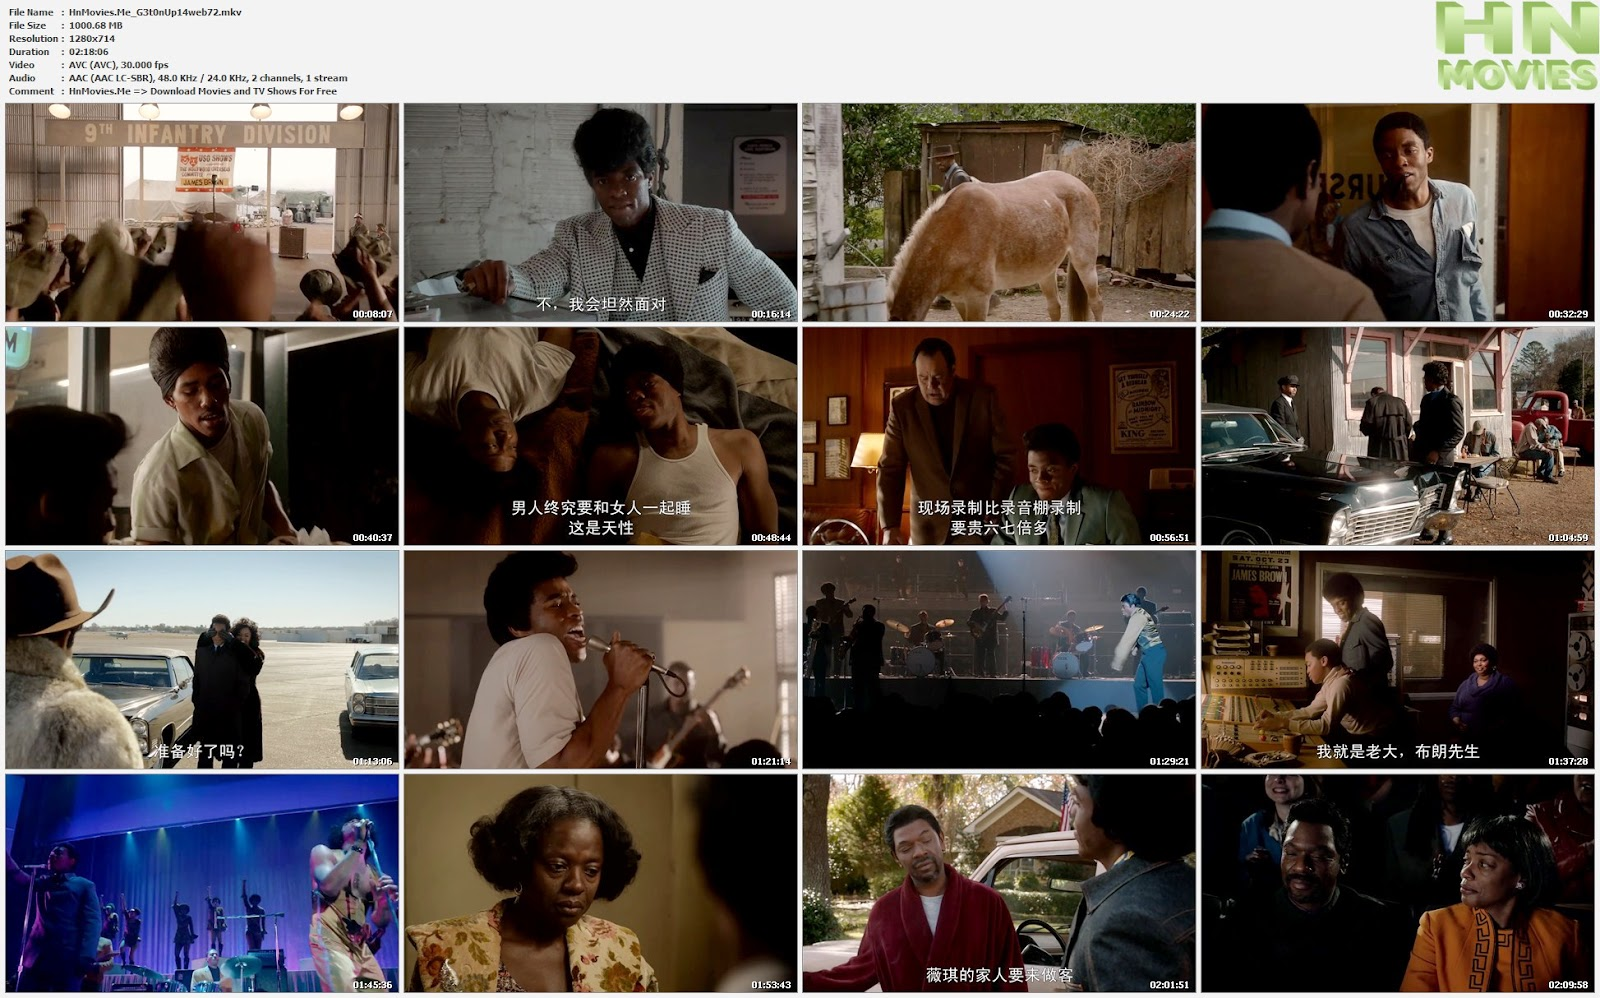 movie screenshot of Get on Up fdmovie.com